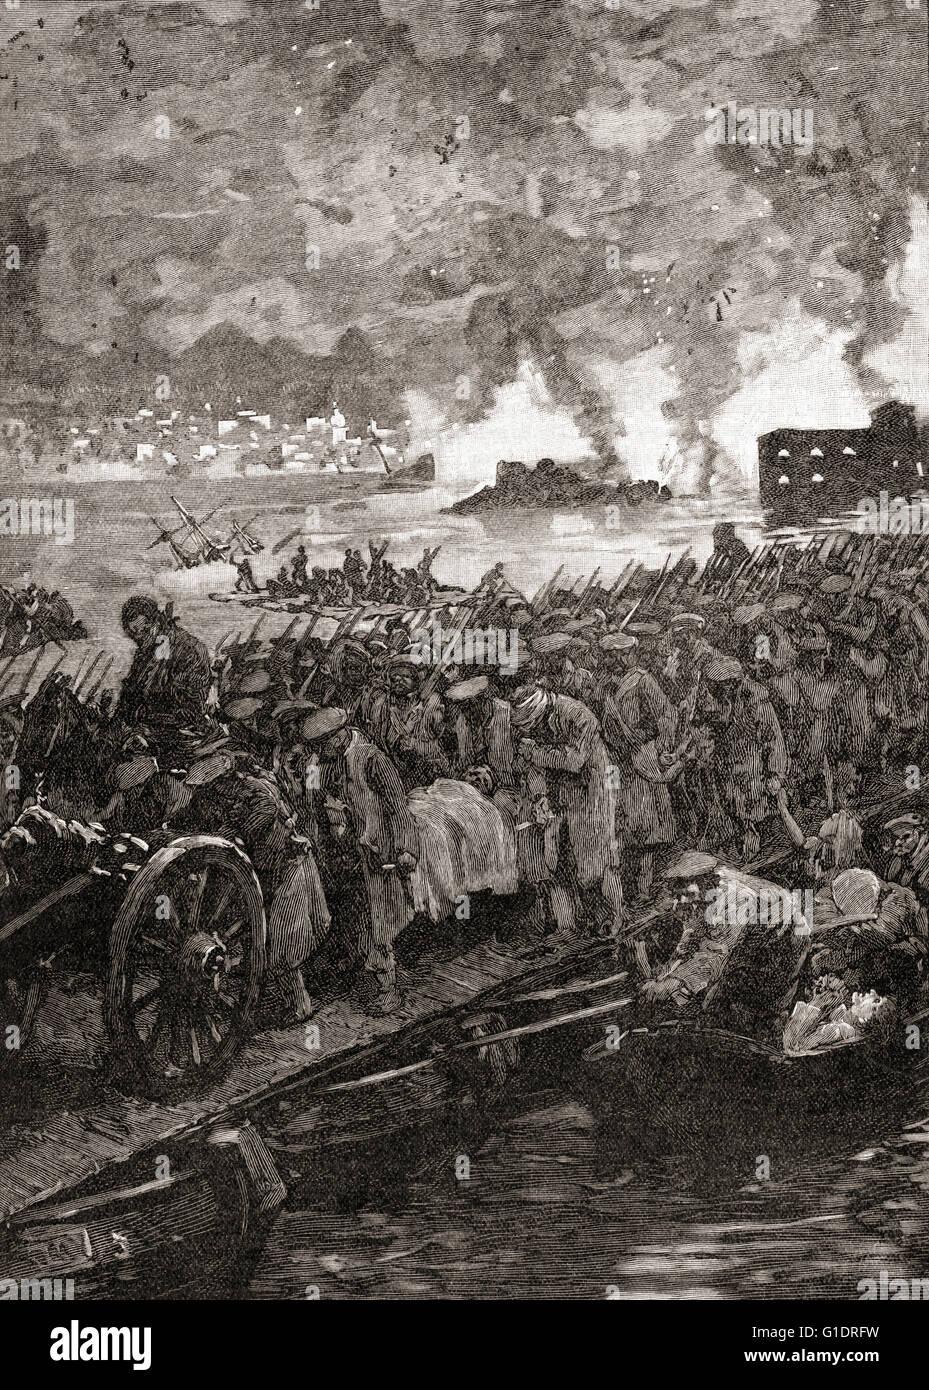 Crimean War.  Siege of Sebastopol.  Russian troops retreat from the city, September, 1855. - Stock Image